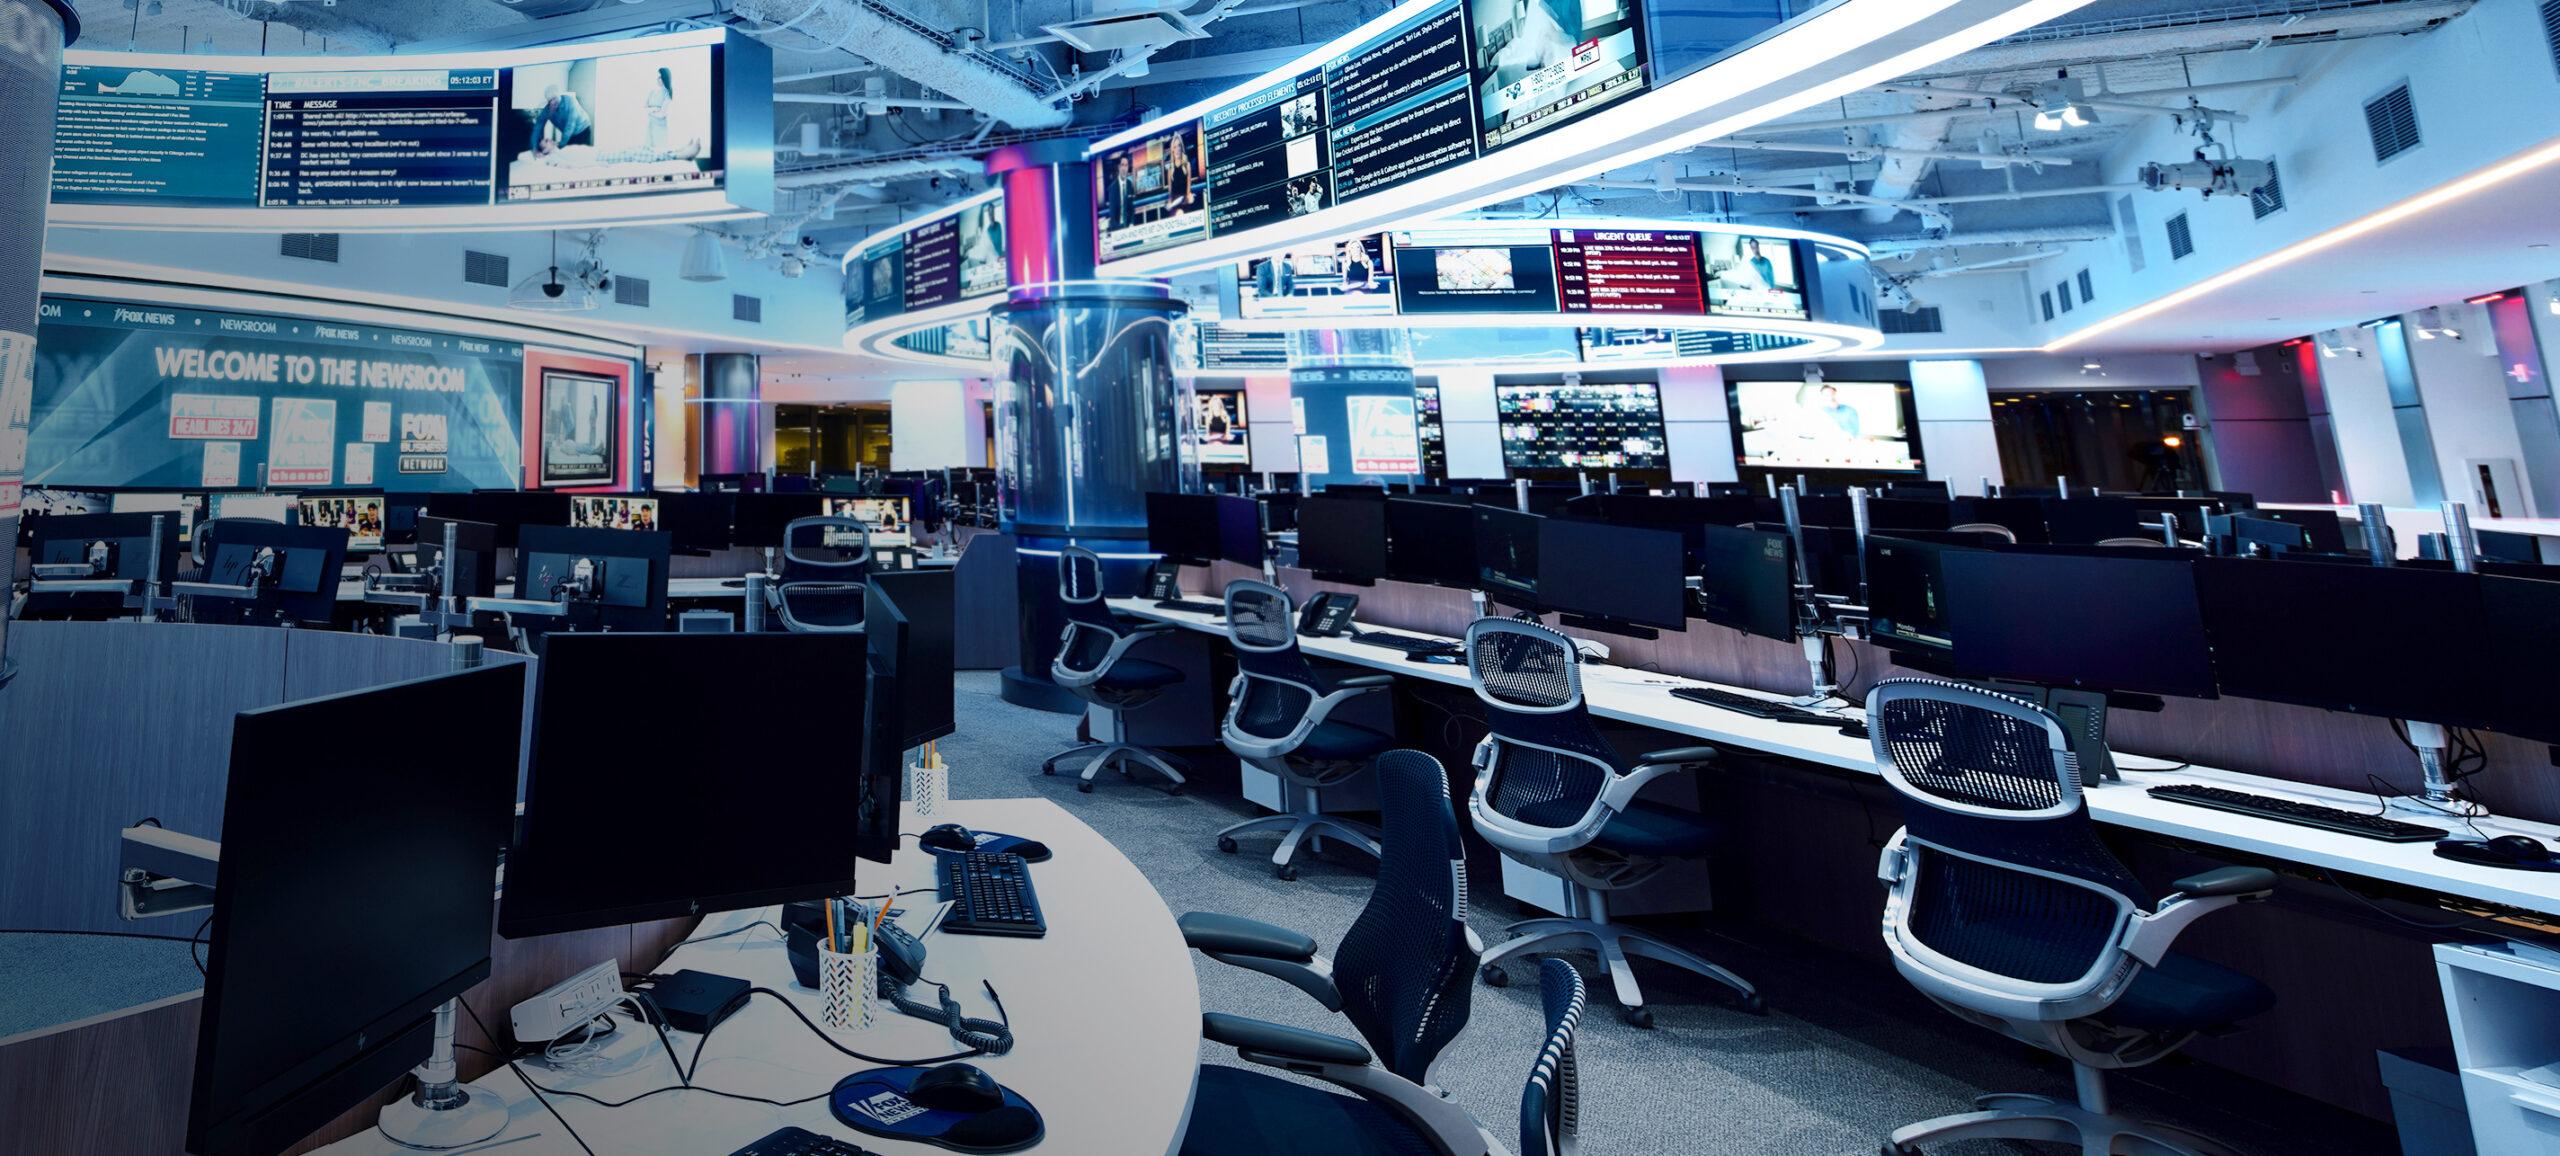 FOX News Newsroom